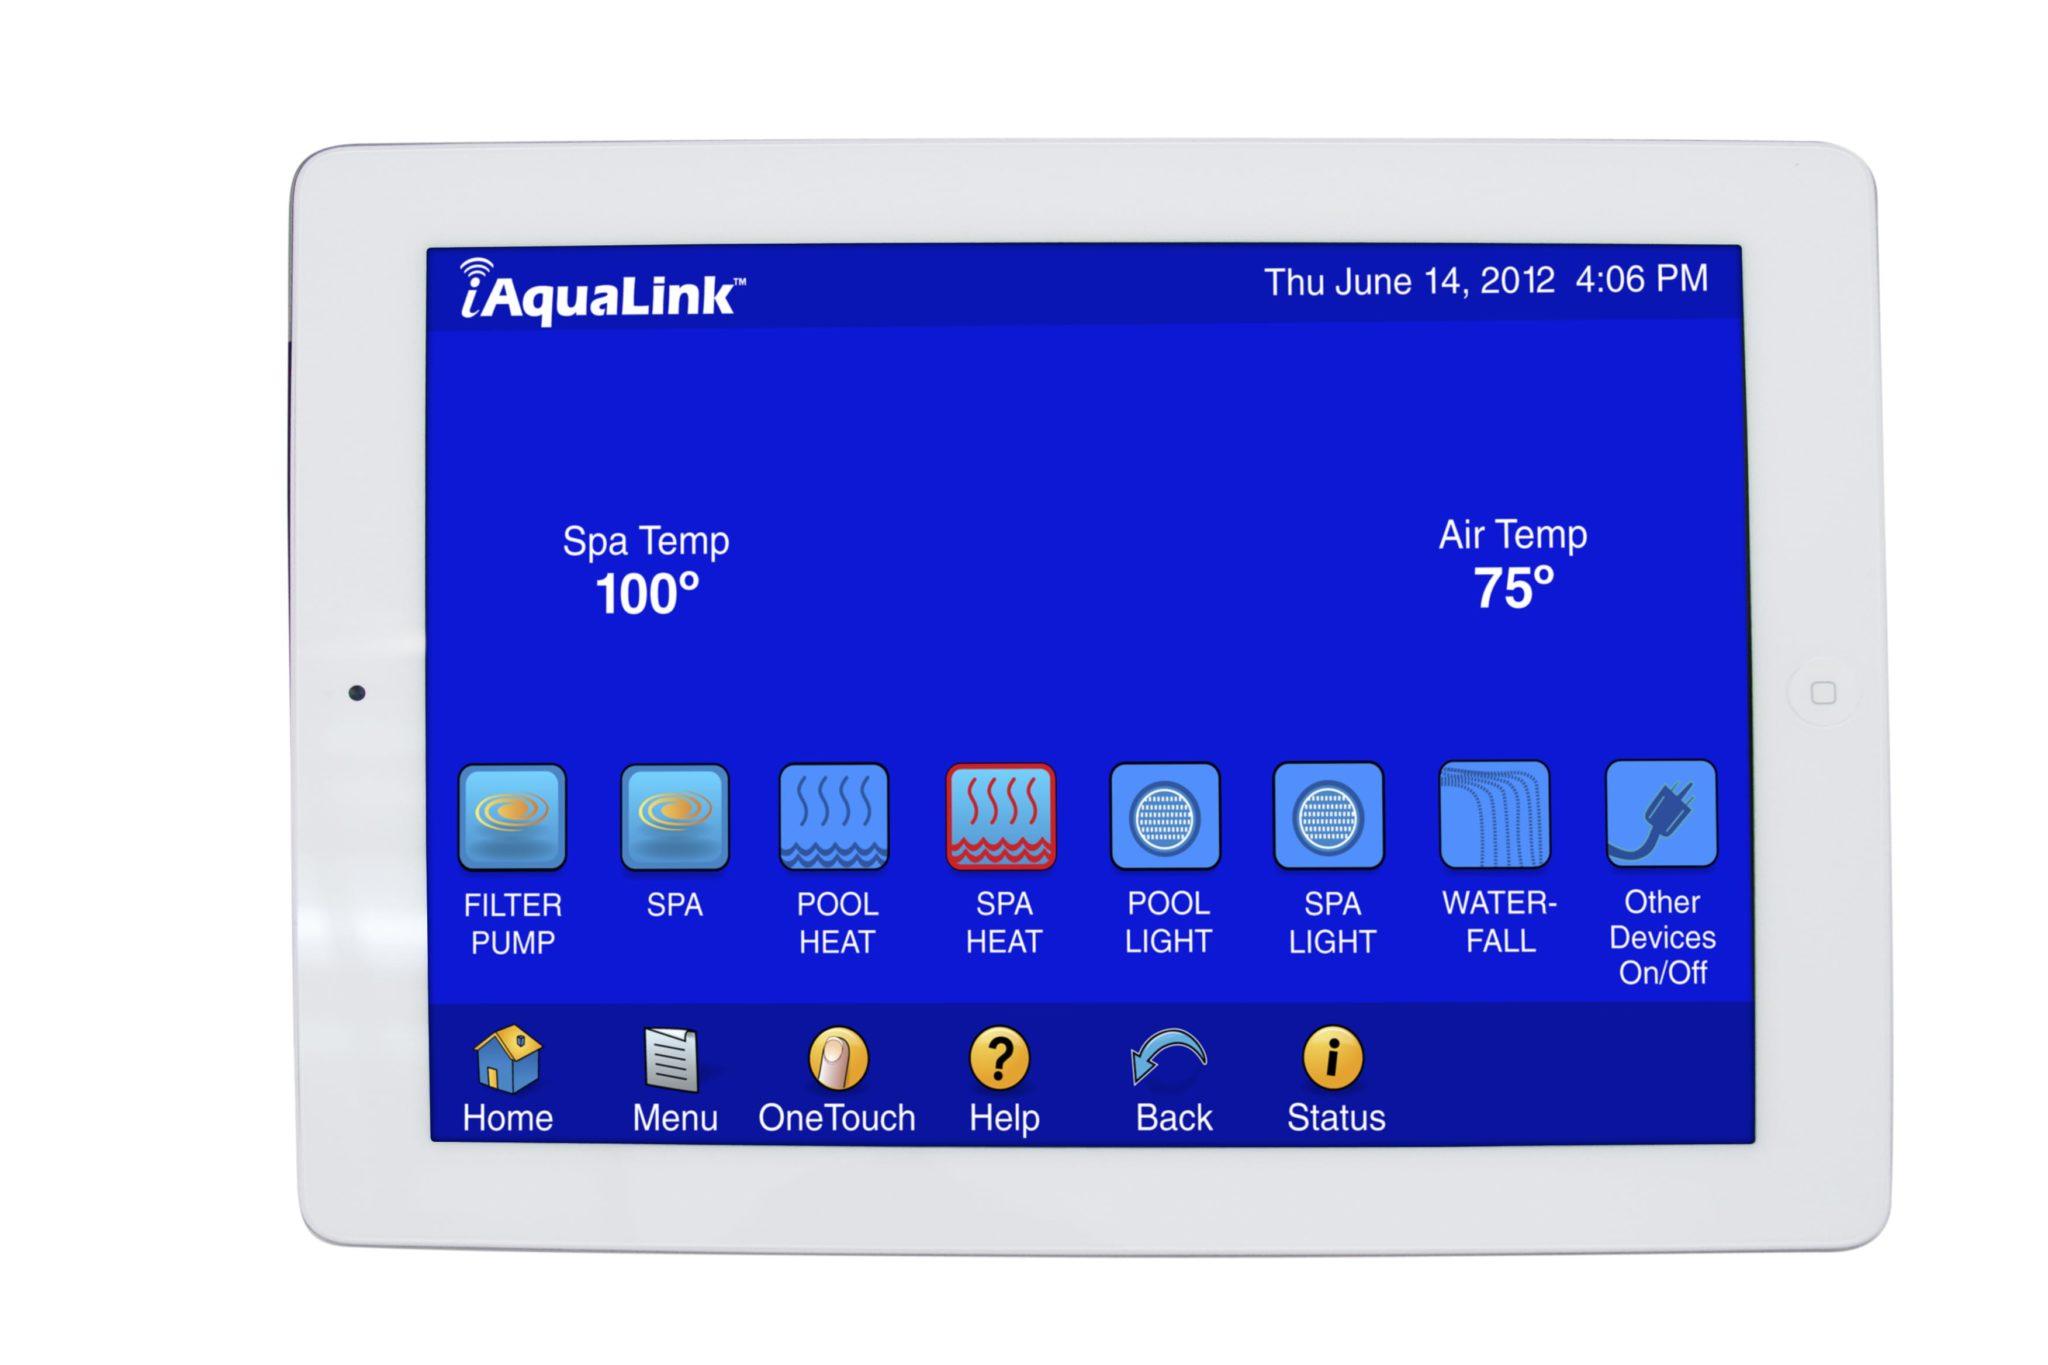 IQ900_iAquaLinkiPad 12 min swimming pool control interfaces danna pools inc jandy aqualink wiring diagram at et-consult.org